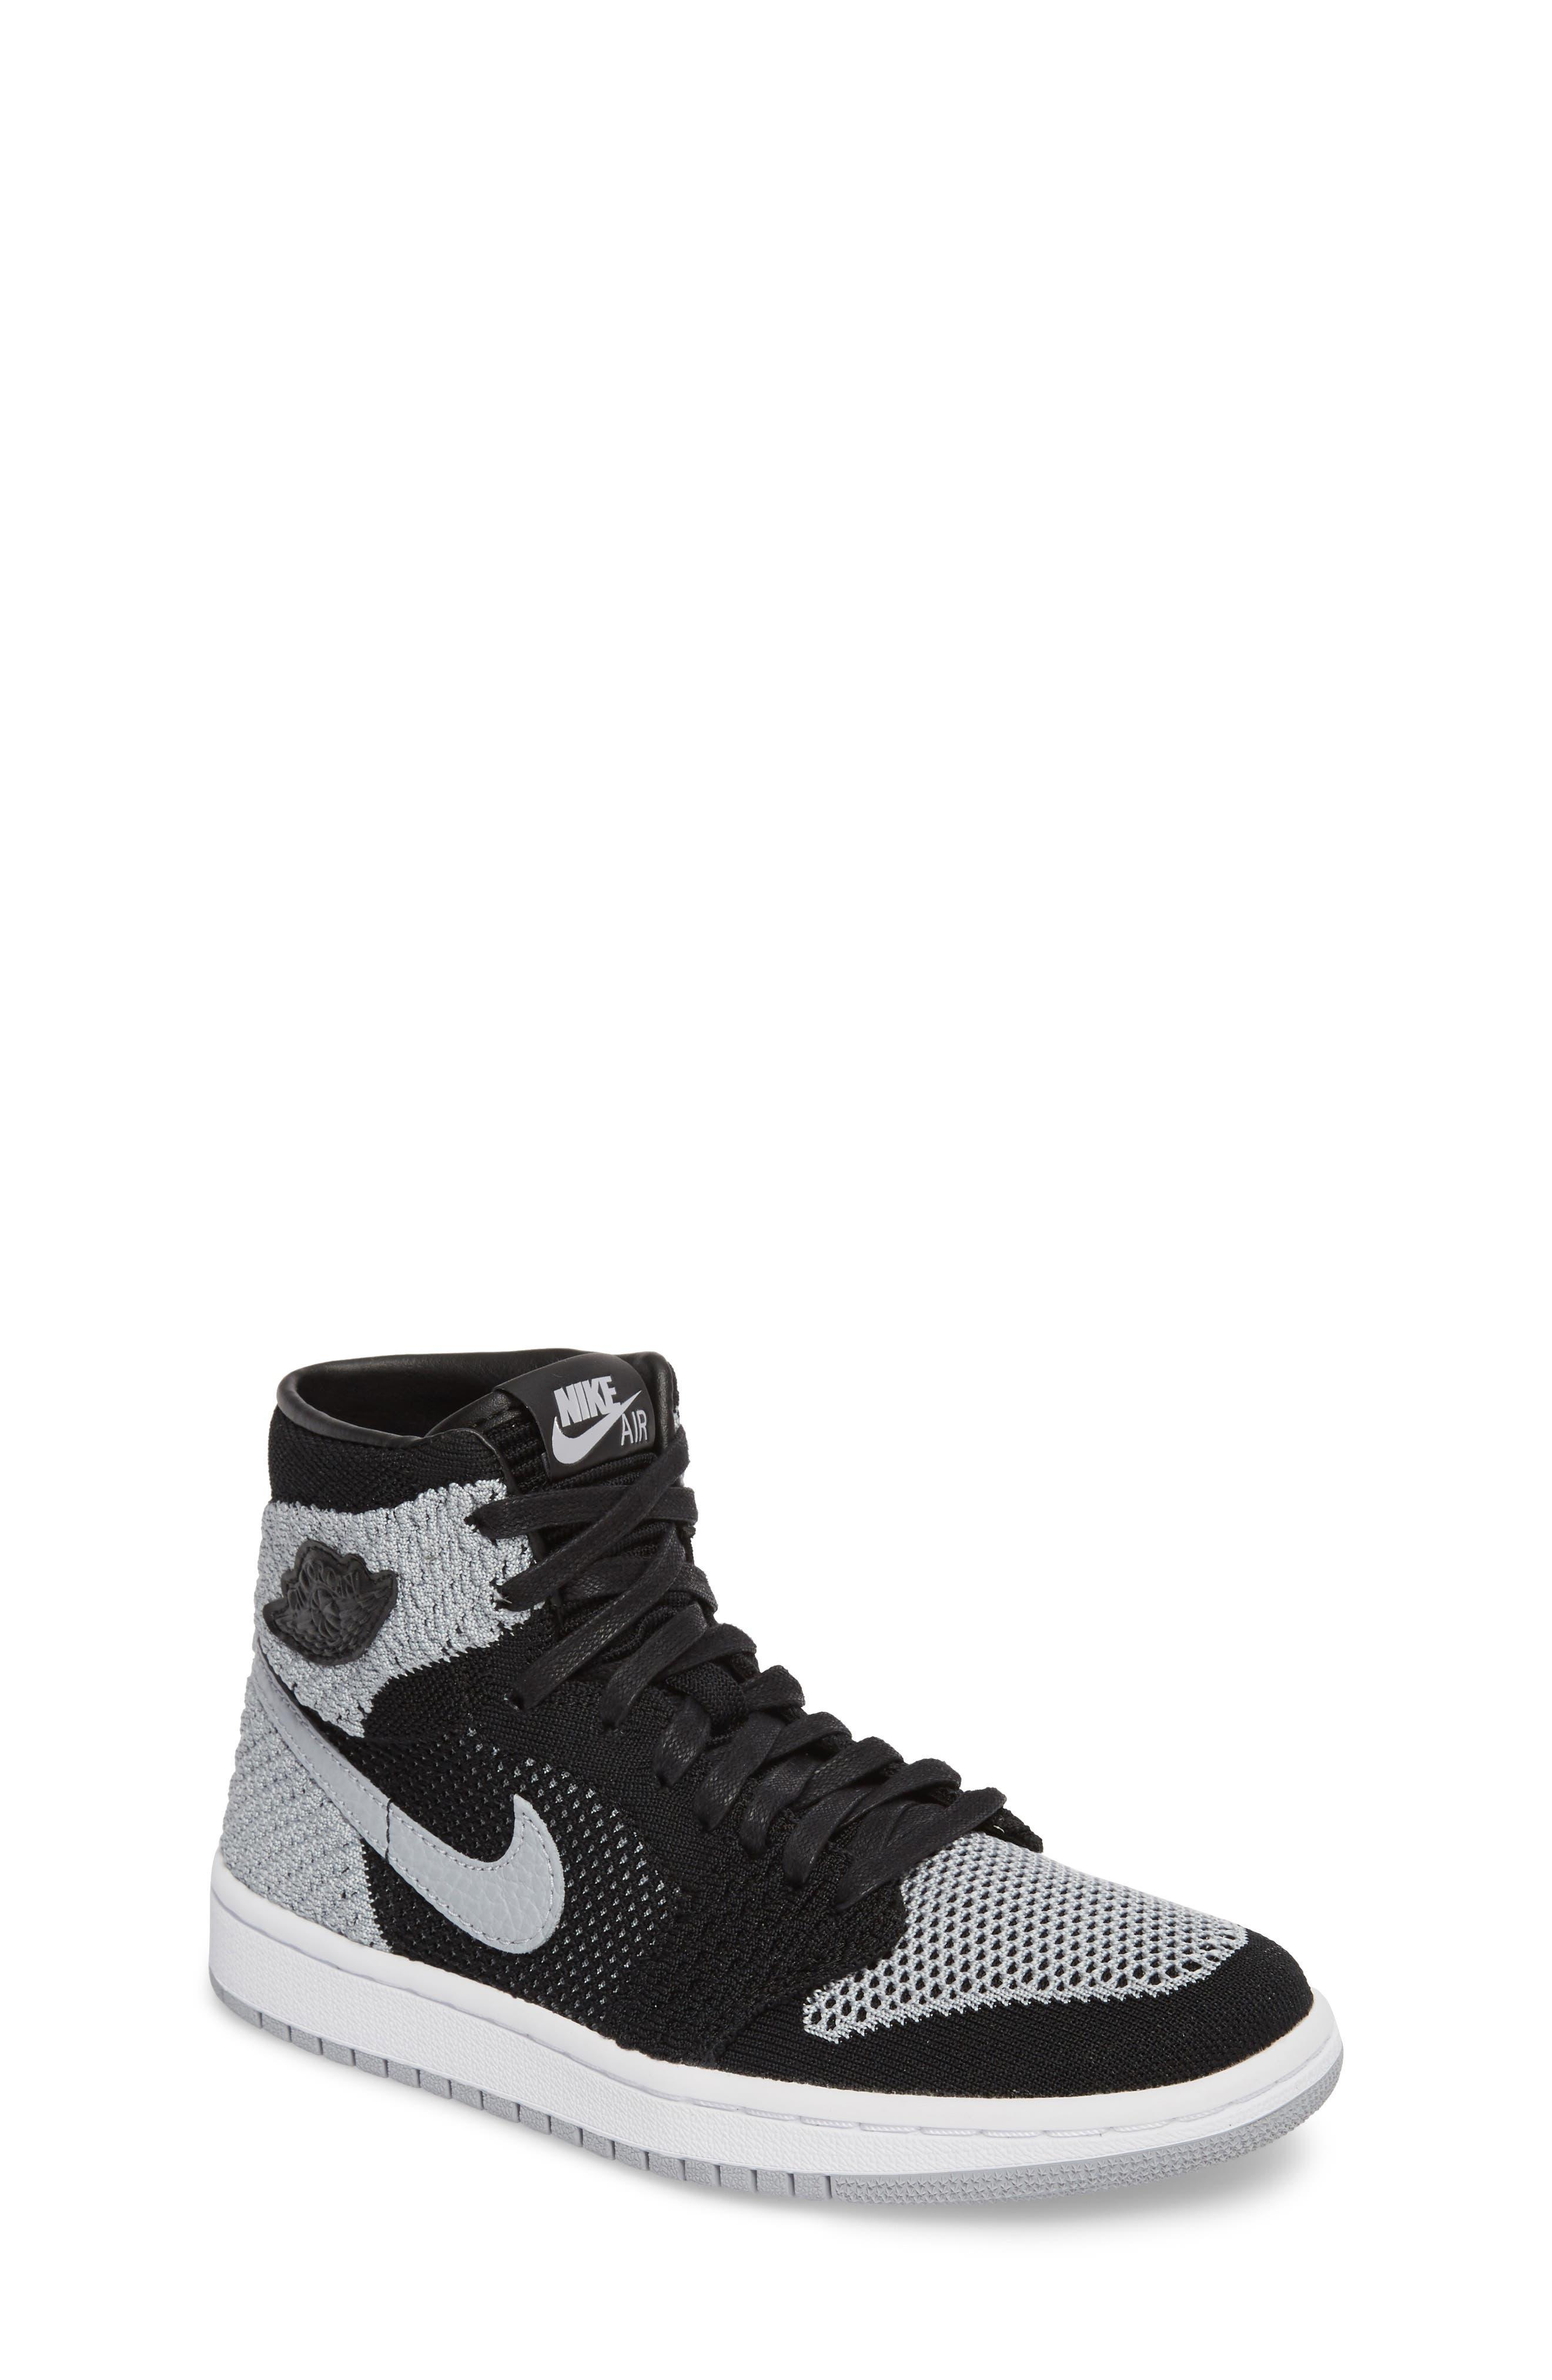 Nike Air Jordan 1 Retro High Flyknit Sneaker (Big Kid)